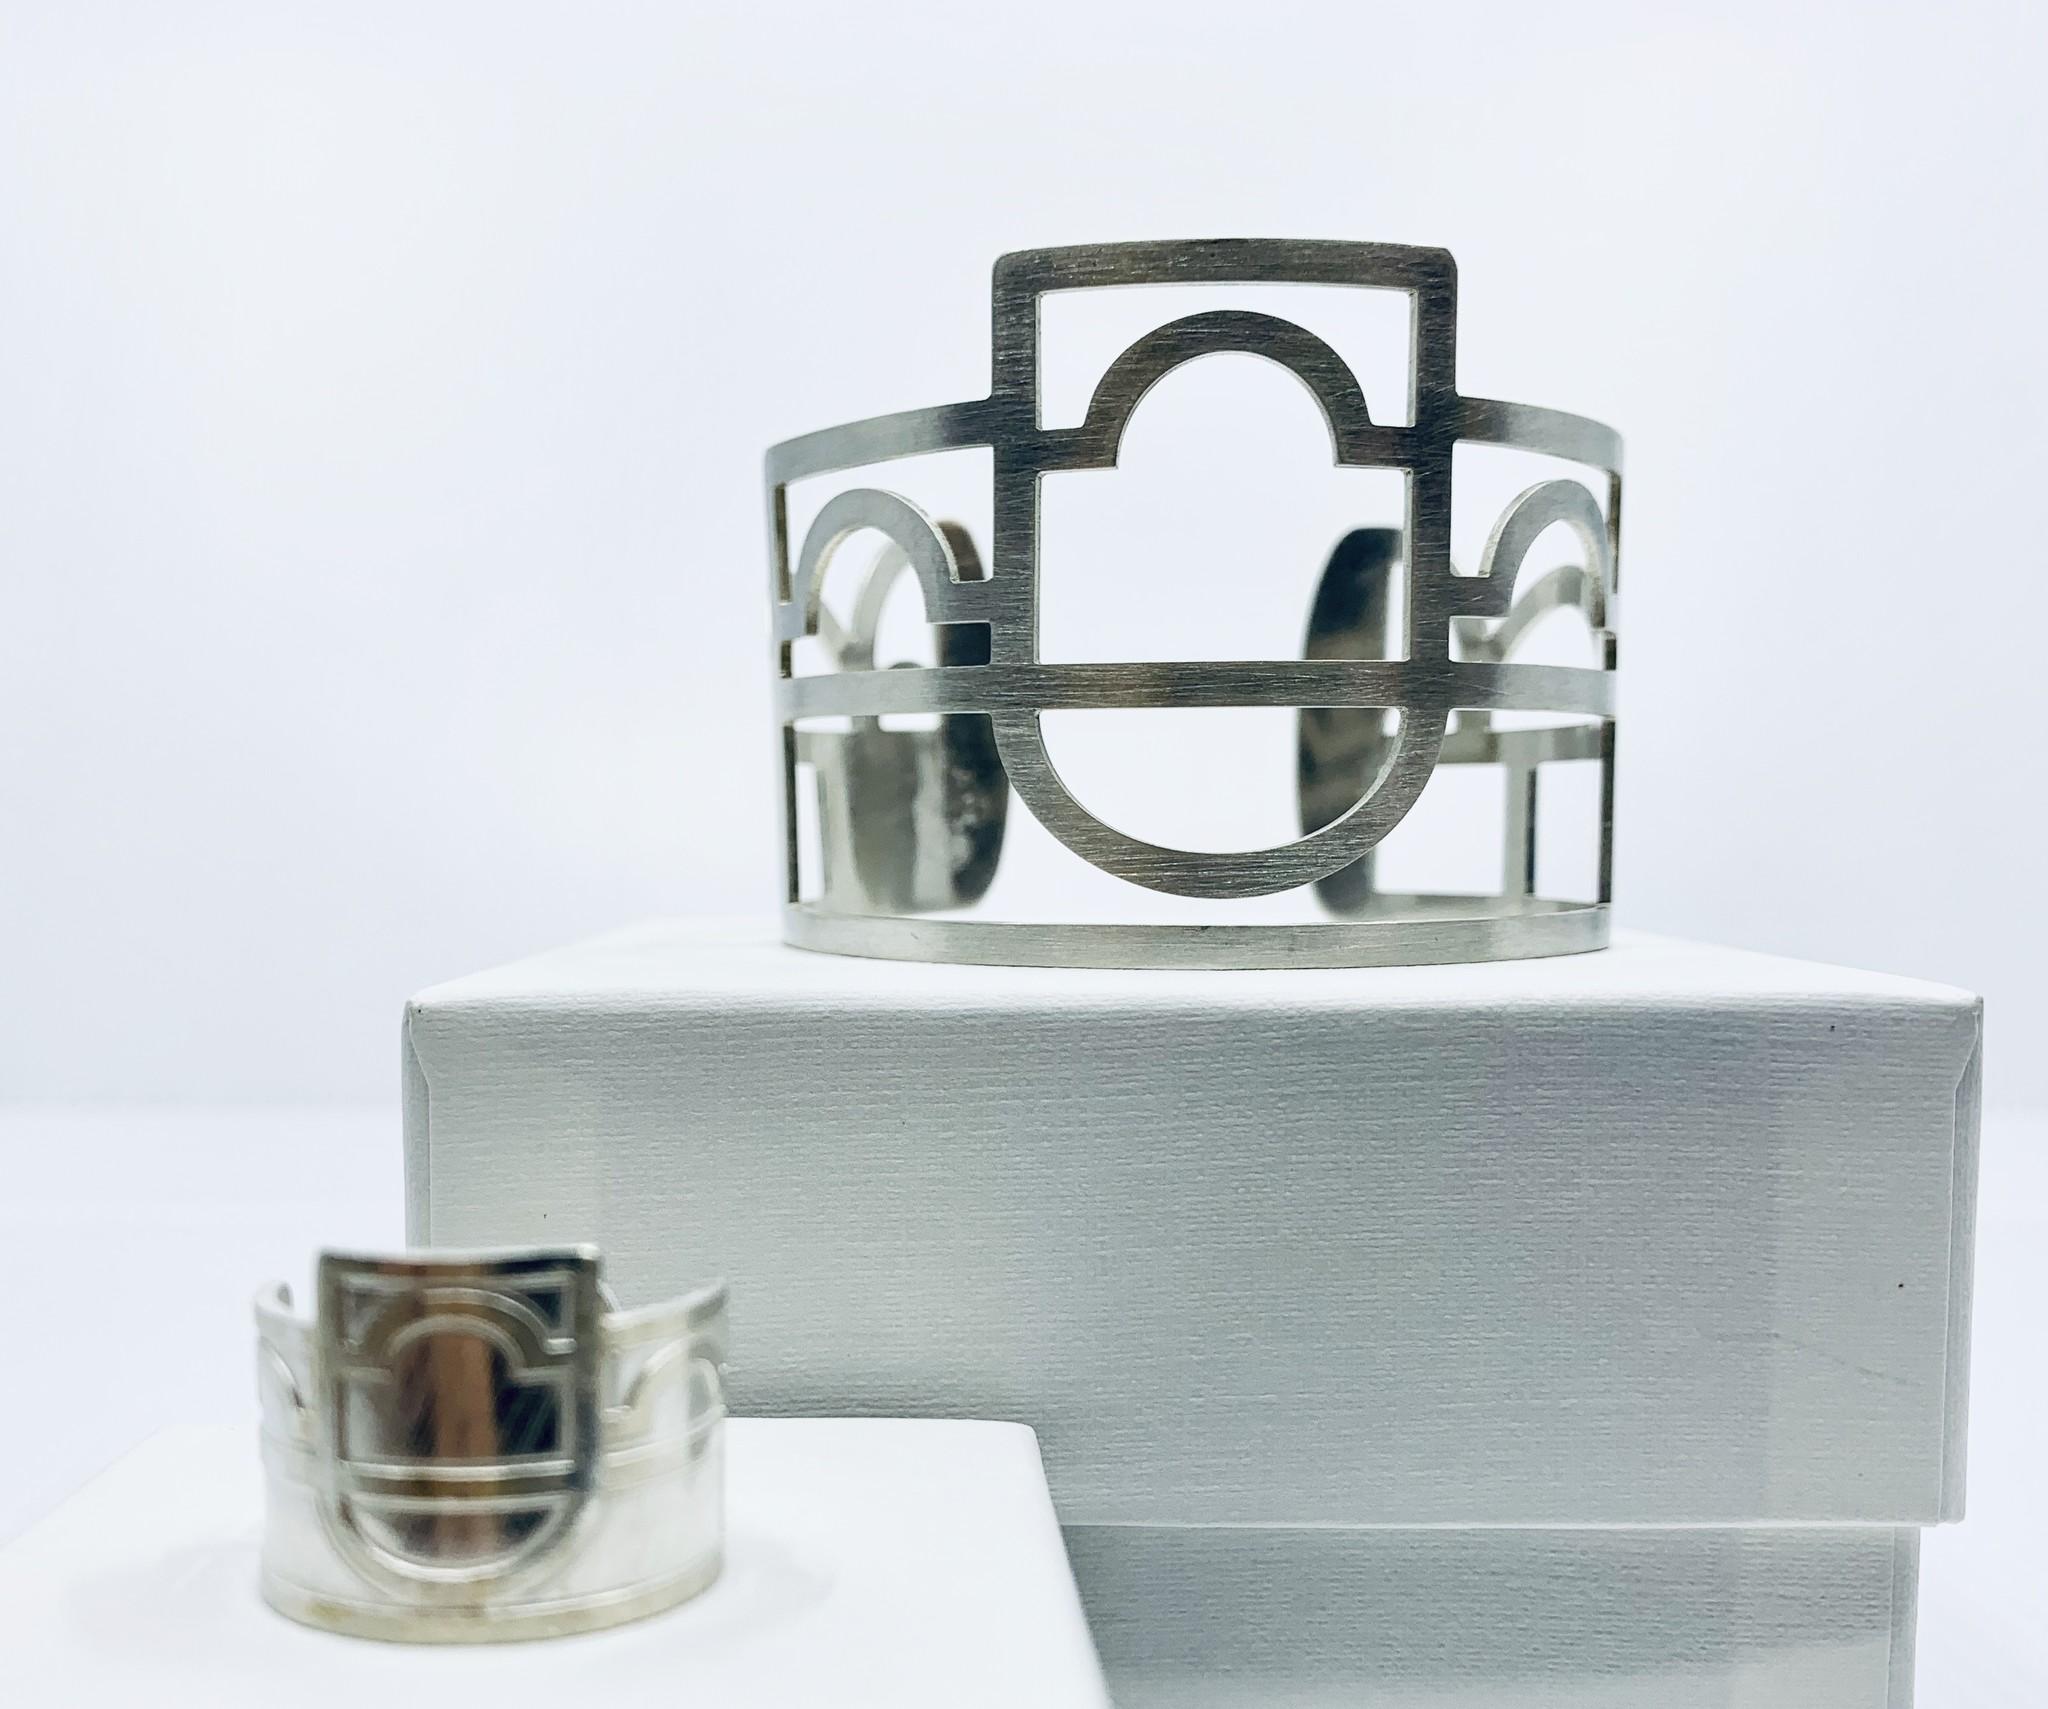 Leen Paelman Bracelet Contours of the Ghent Altarpiece - Leen Paelman